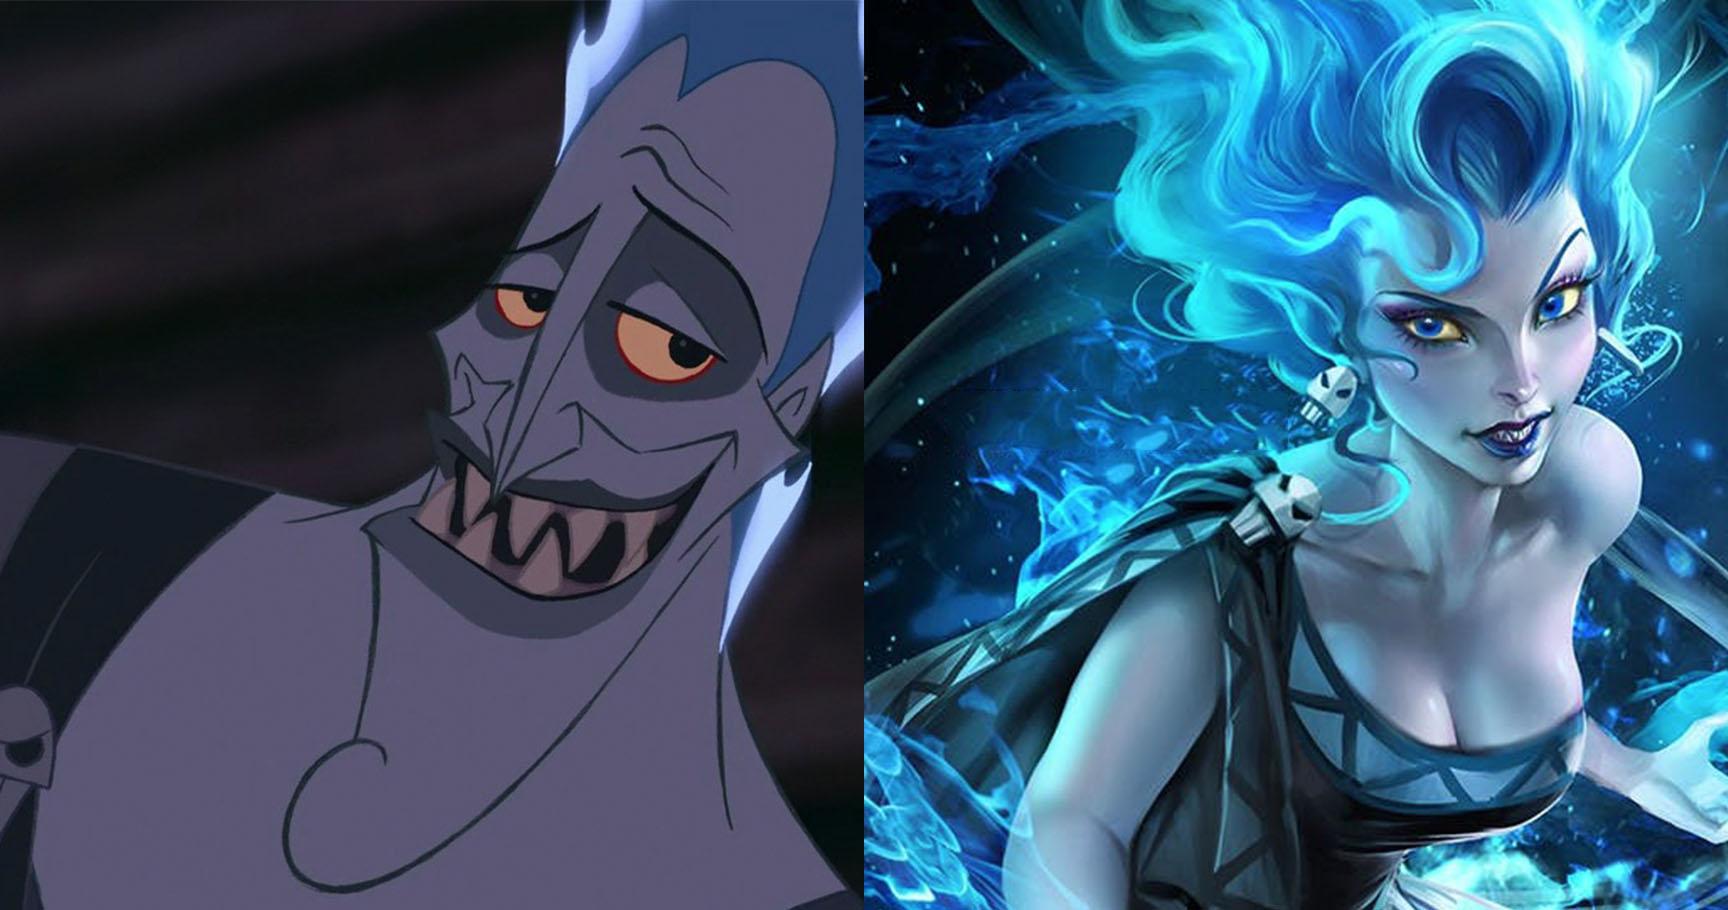 Disney Villains Reimagined As Princesses